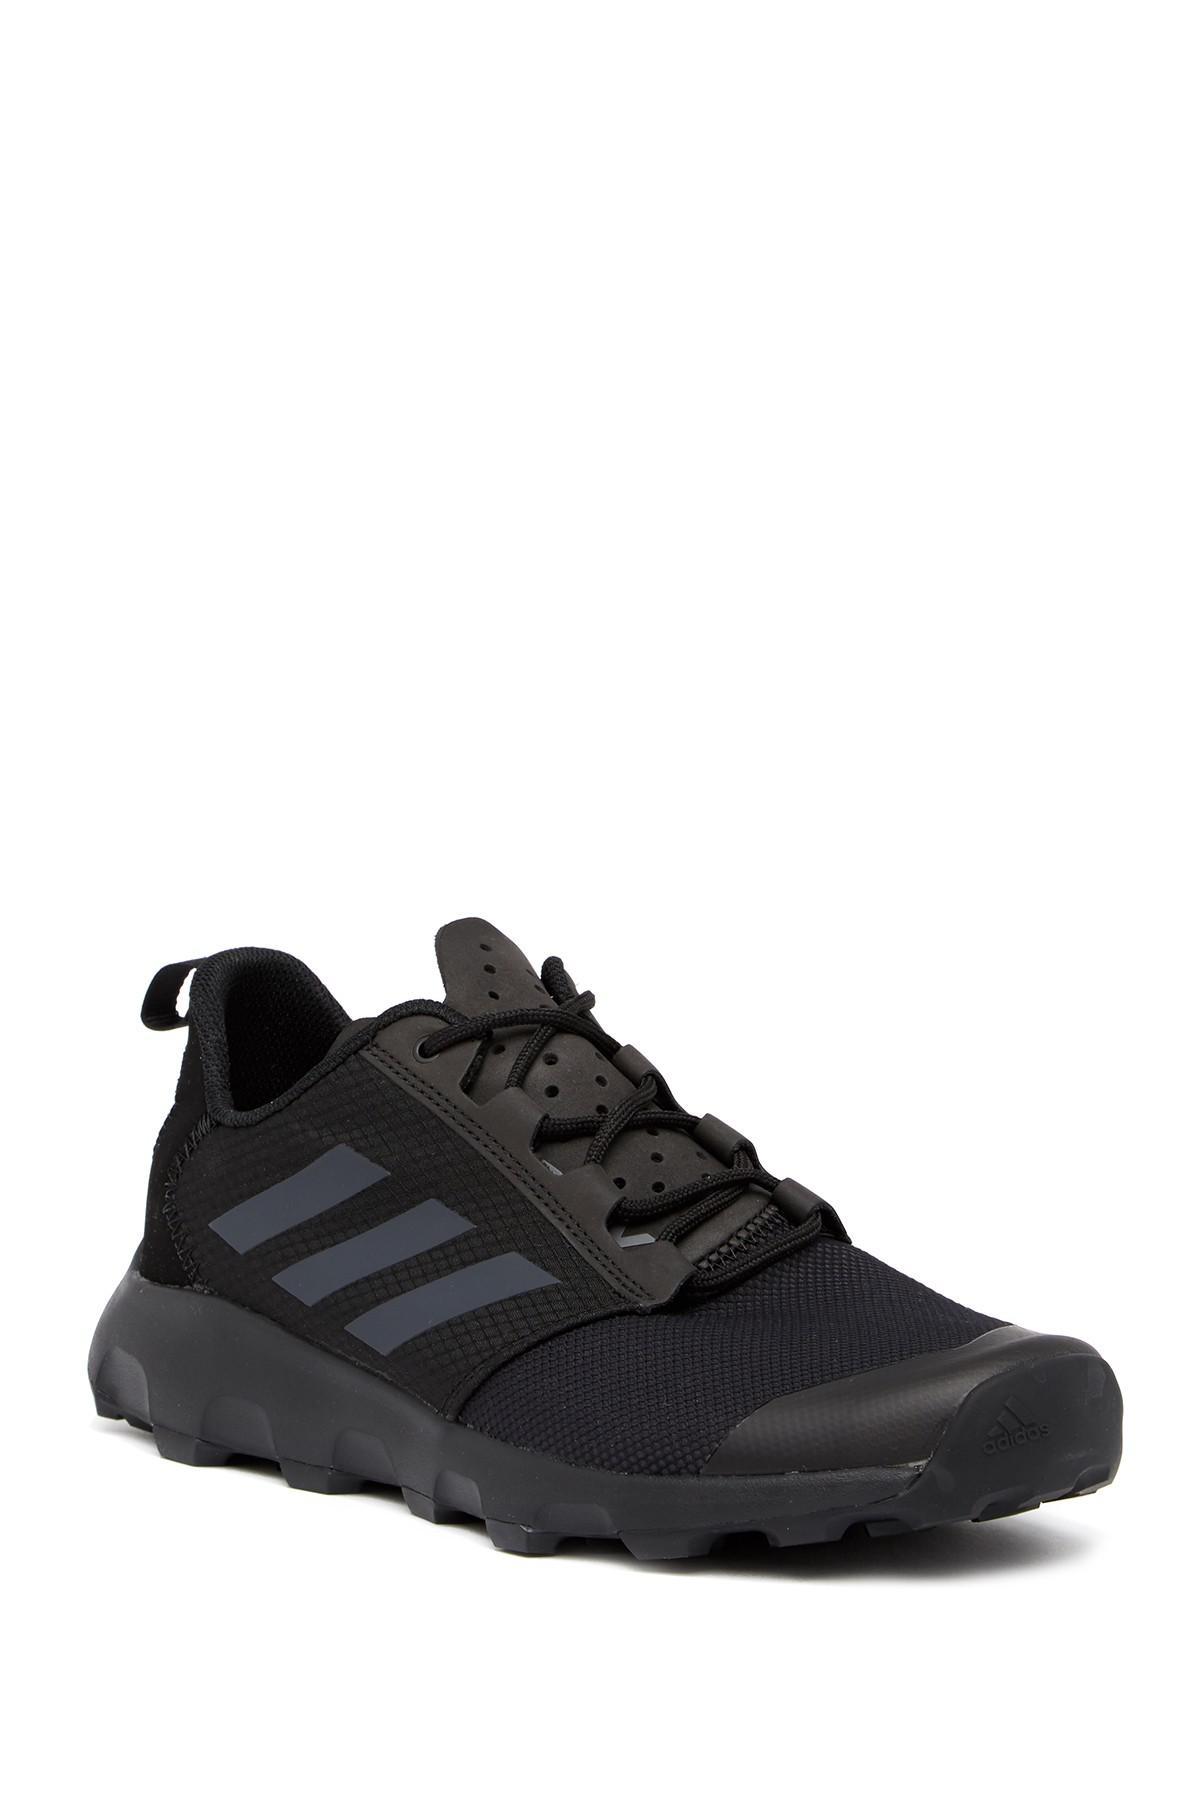 f4863fe1046 Lyst - adidas Terrex Voyager Dlx Sneaker in Black for Men